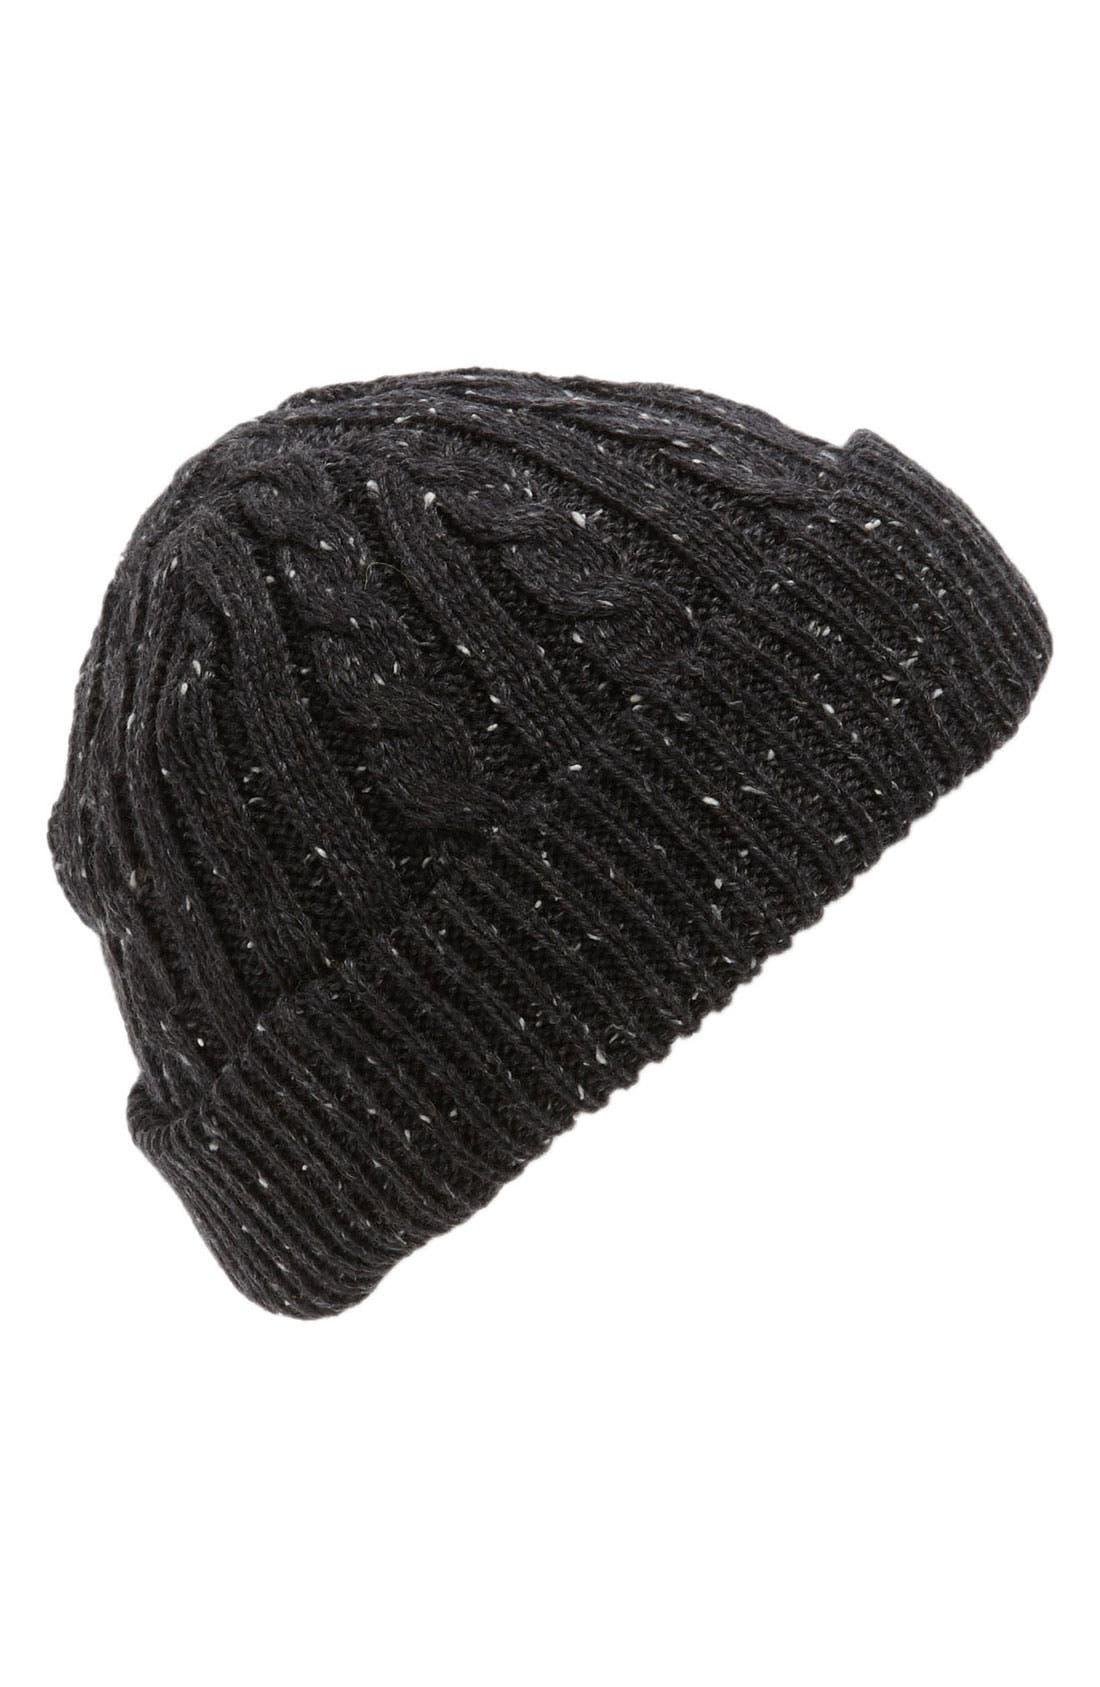 Alternate Image 1 Selected - Topman Acrylic Knit Cap